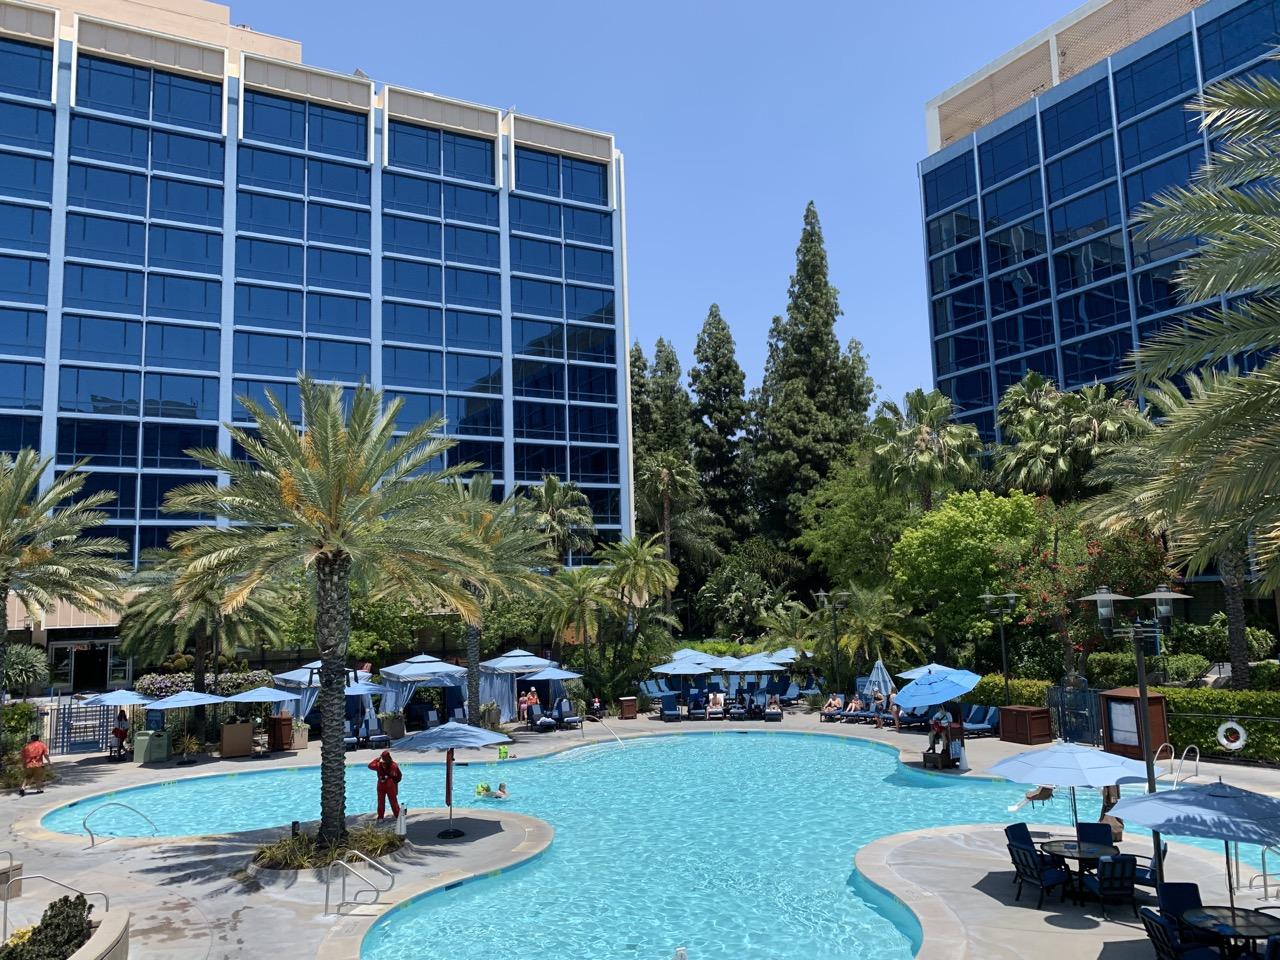 disneyland hotel pool 2.jpeg